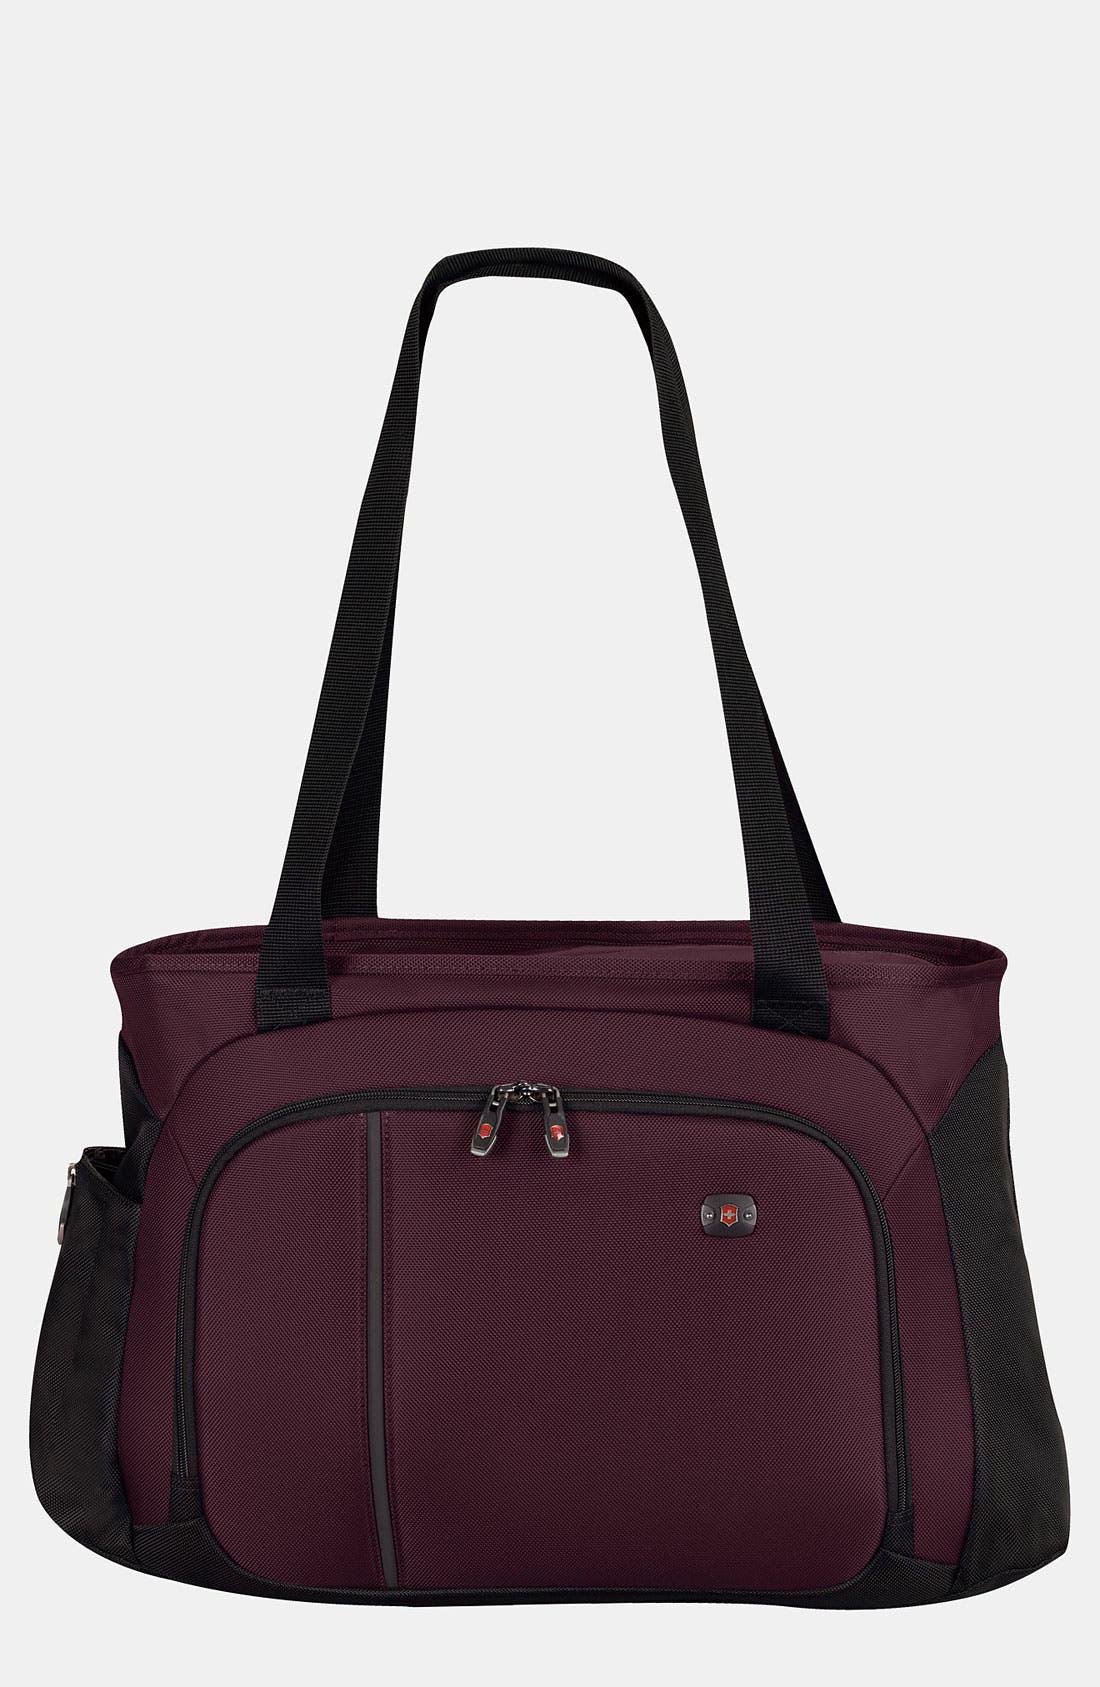 Alternate Image 1 Selected - Victorinox Swiss Army® Zip Tote Bag